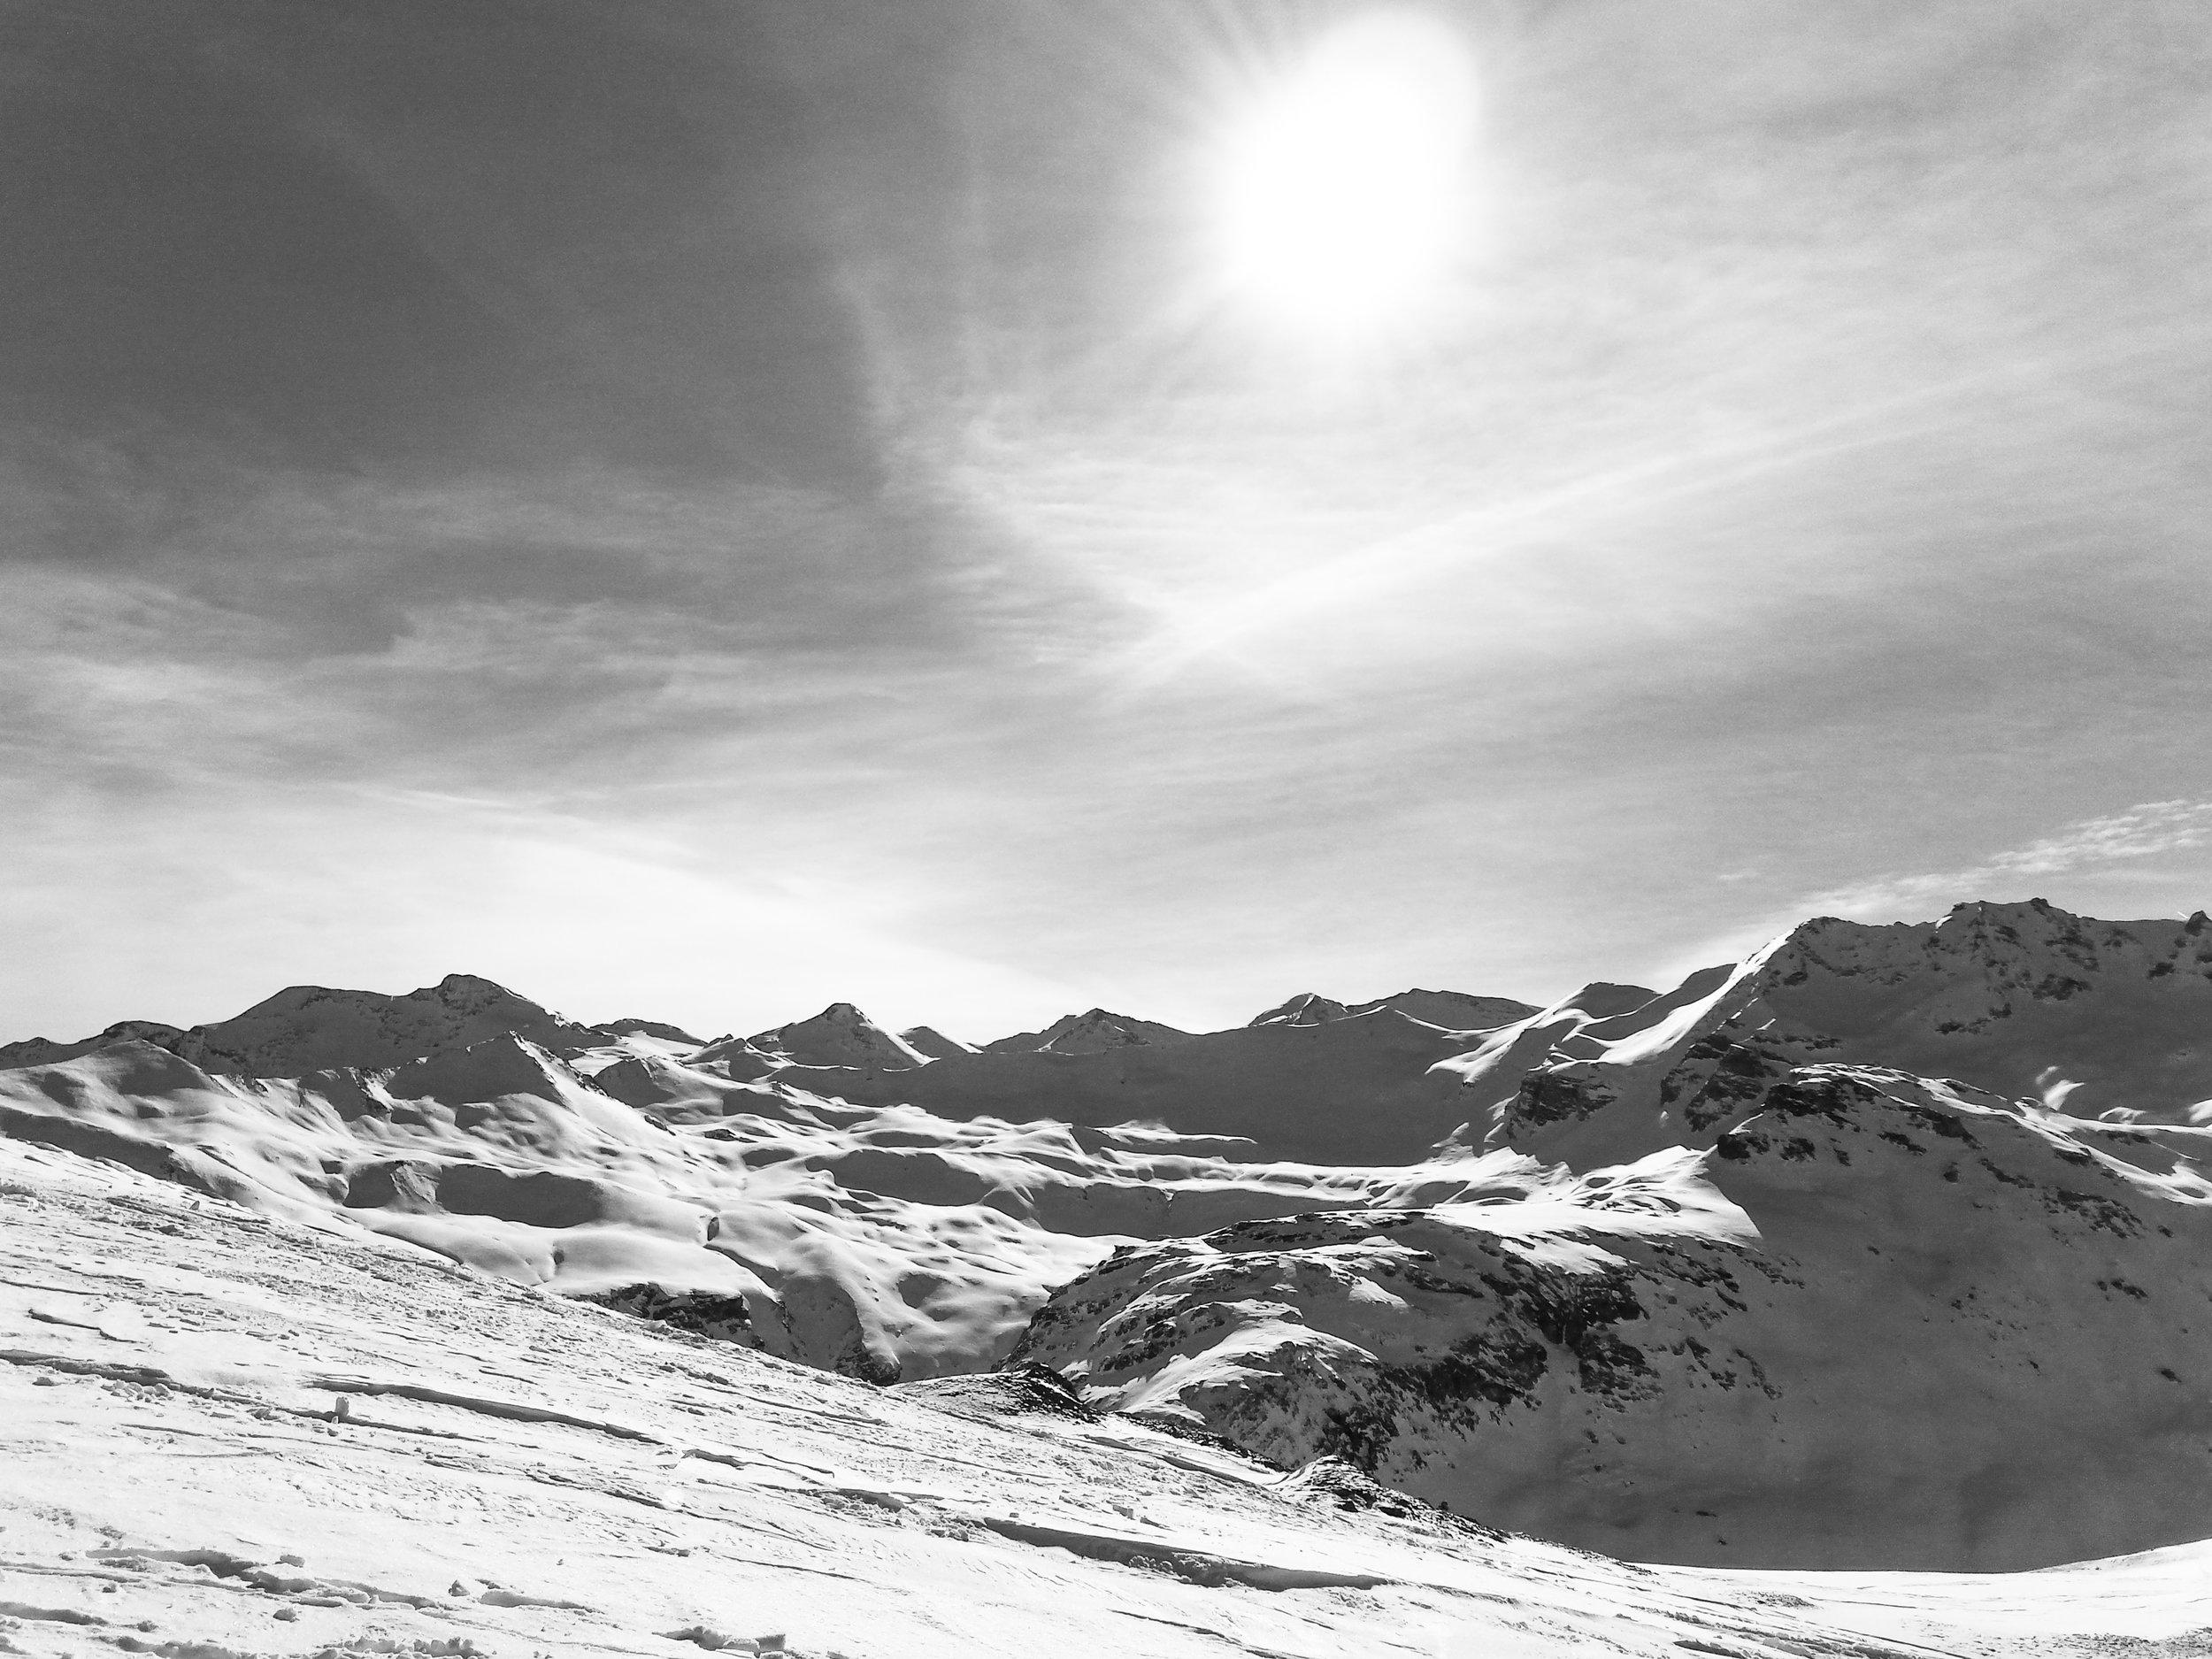 122140-val-d'Isère-snowboarding-ucpa.jpg